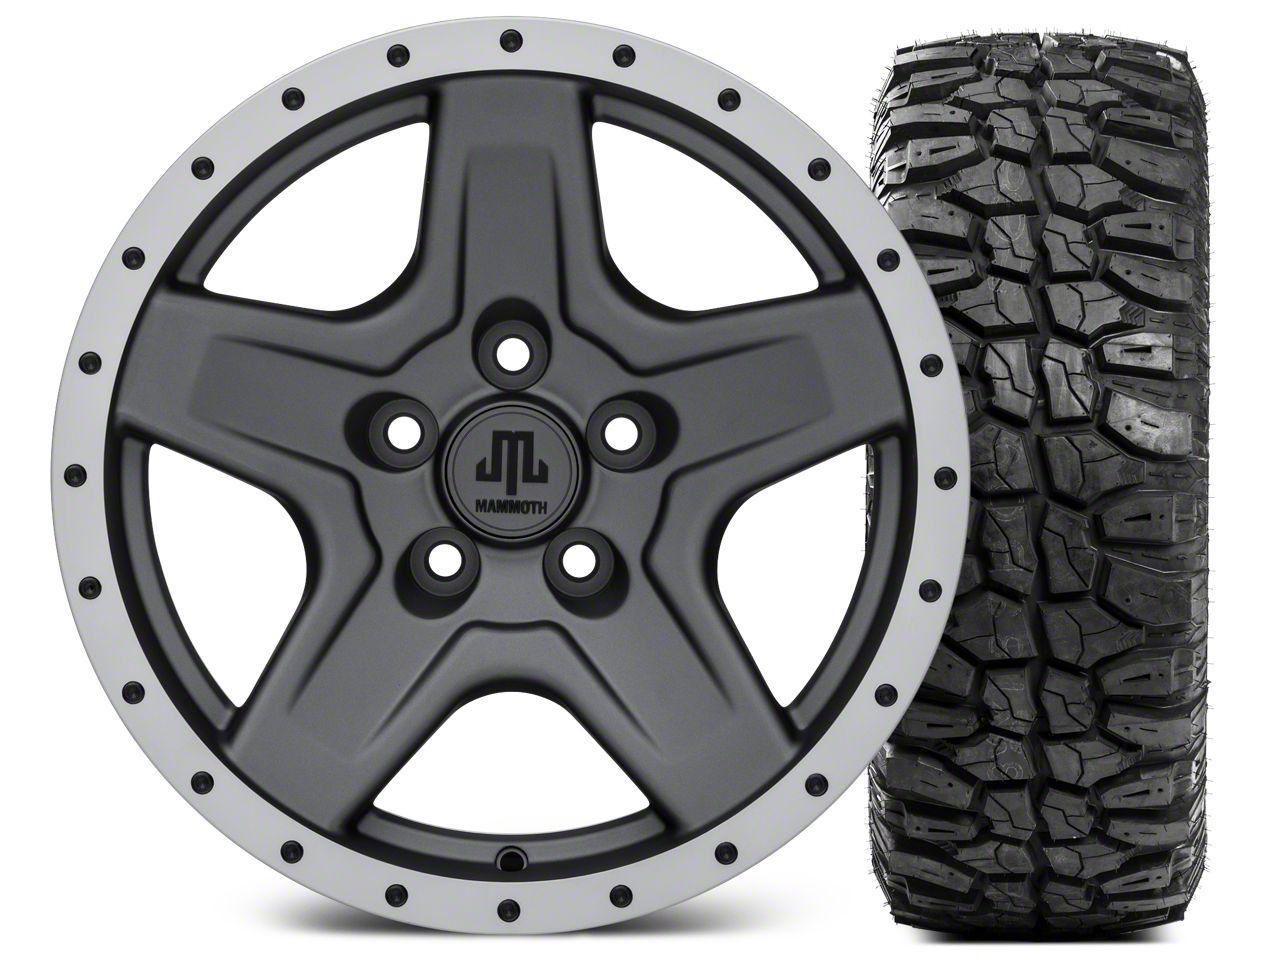 Mammoth Boulder Beadlock Style Charcoal 16x8 Wheel & Mudclaw Radial 315/75- 16 Tire Kit (87-06 Jeep Wrangler YJ & TJ)